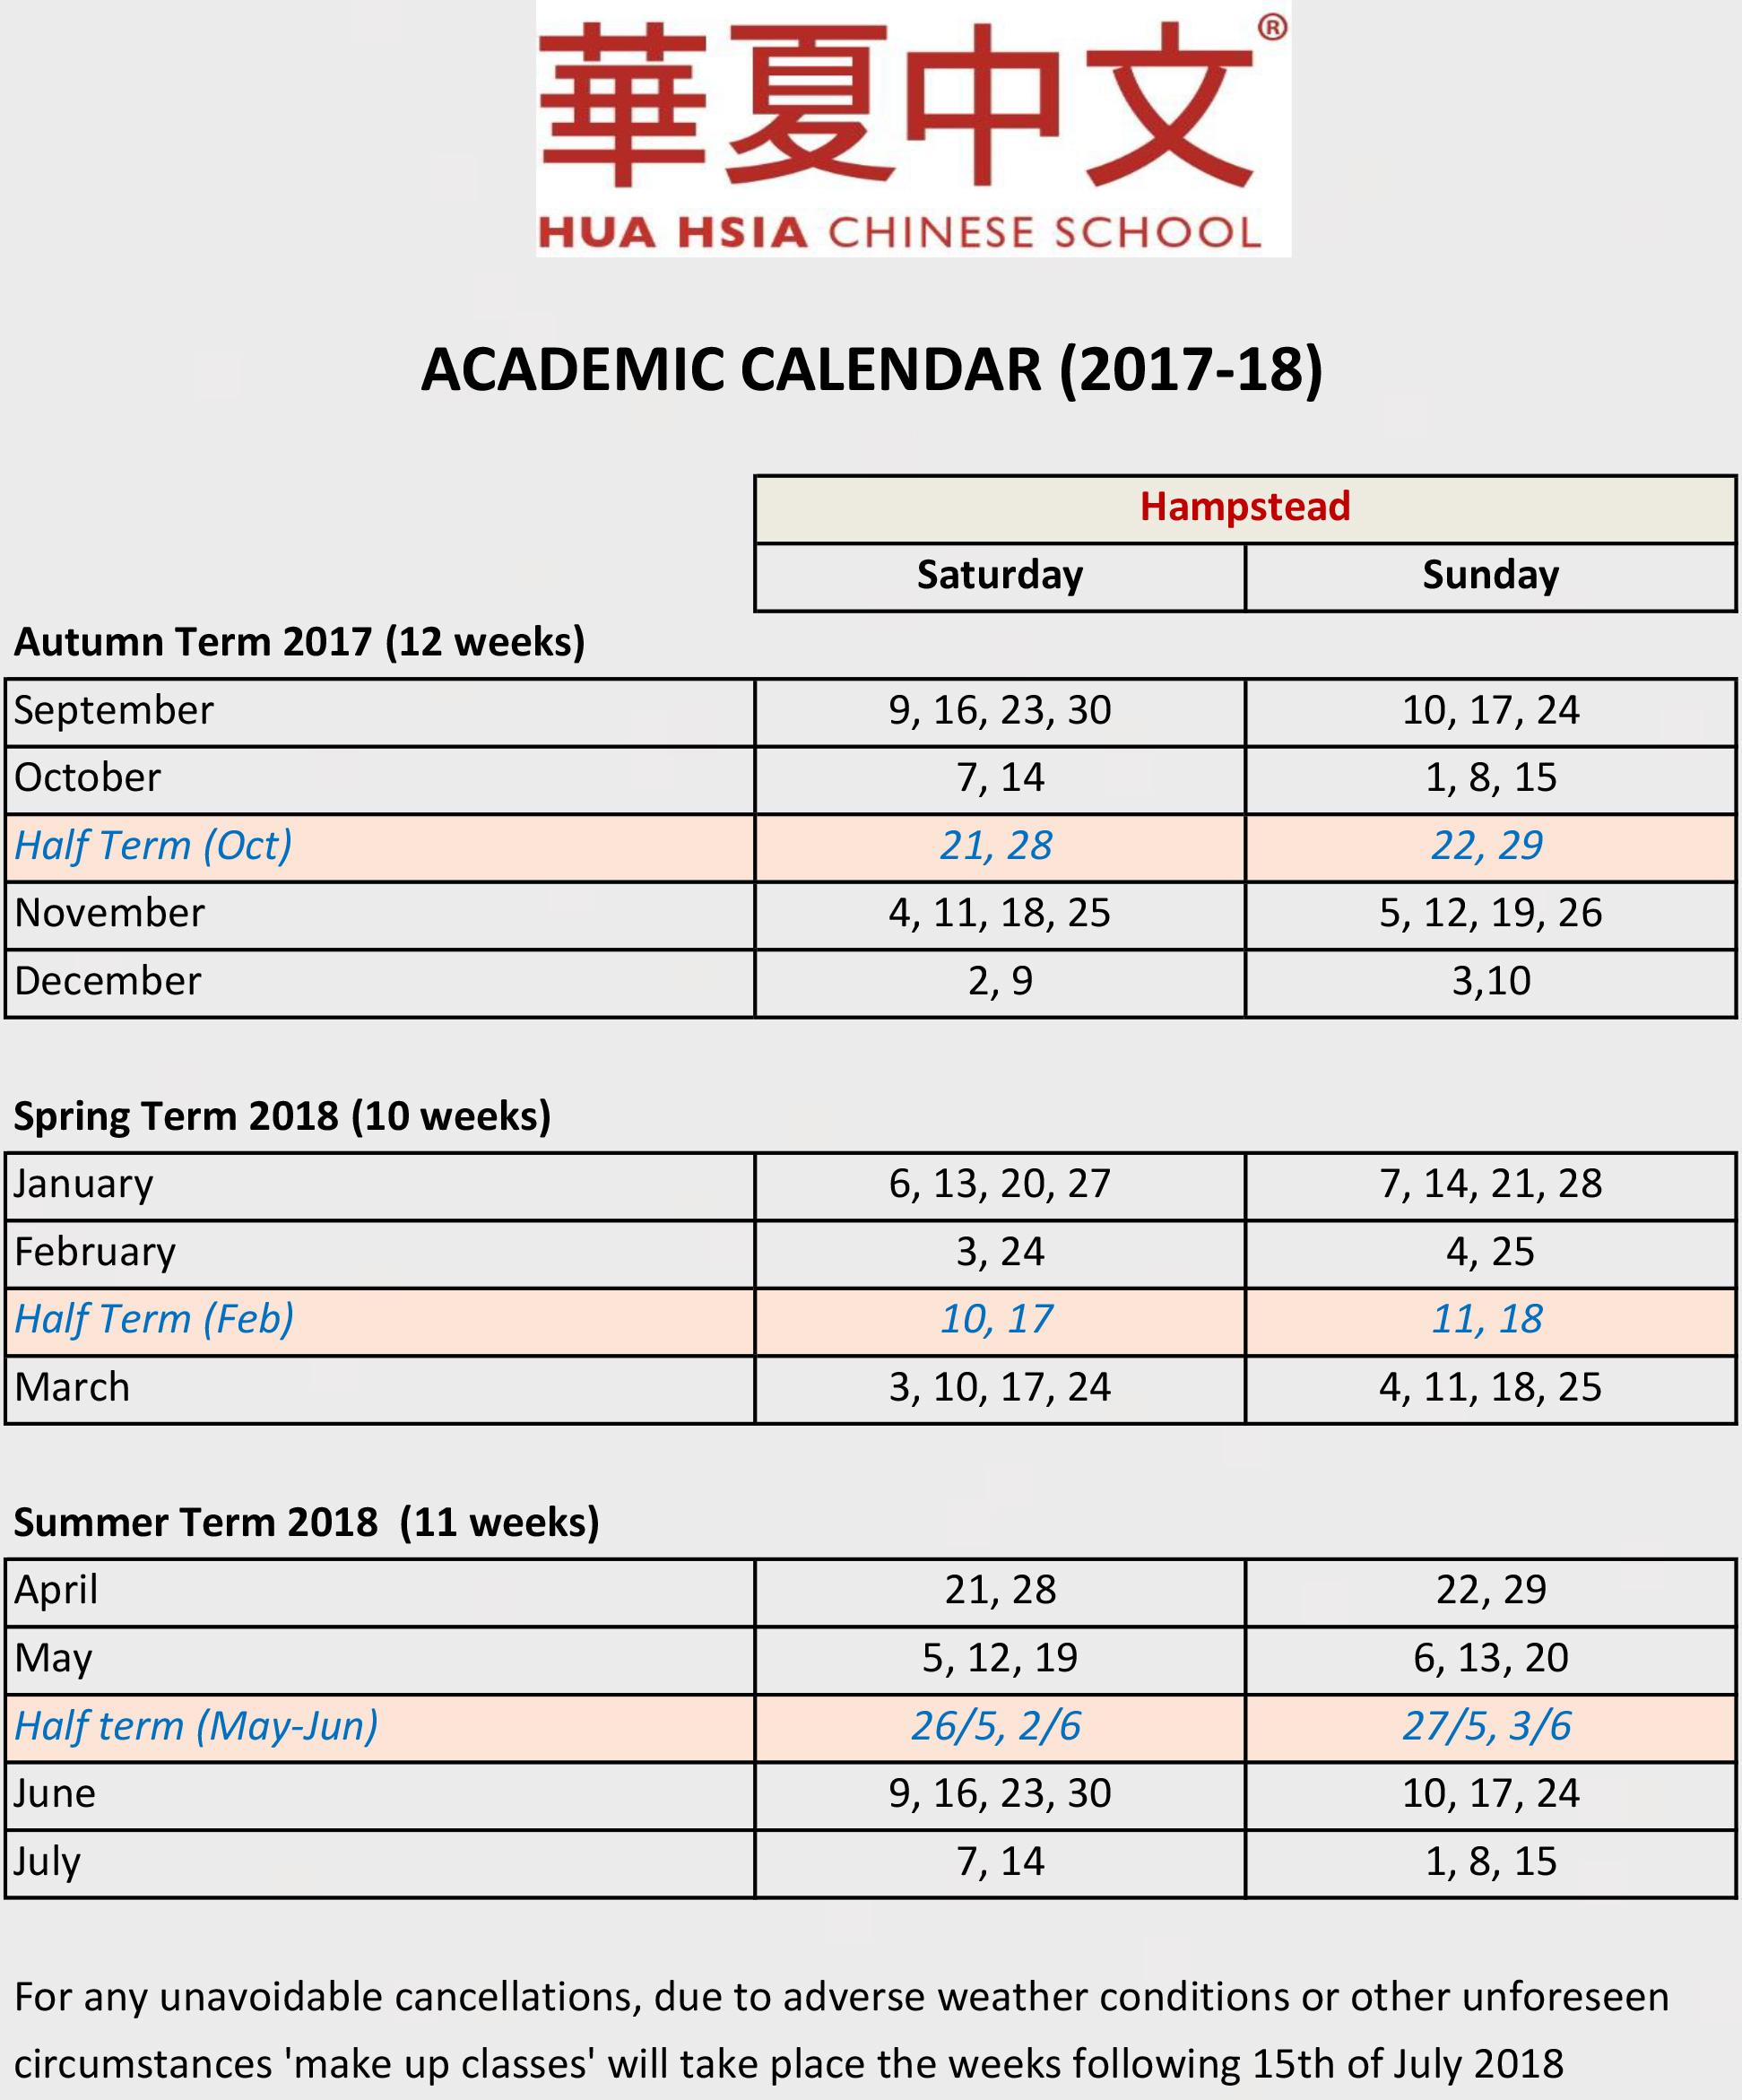 Academic-Calendar-(2017-18)—Hampstead